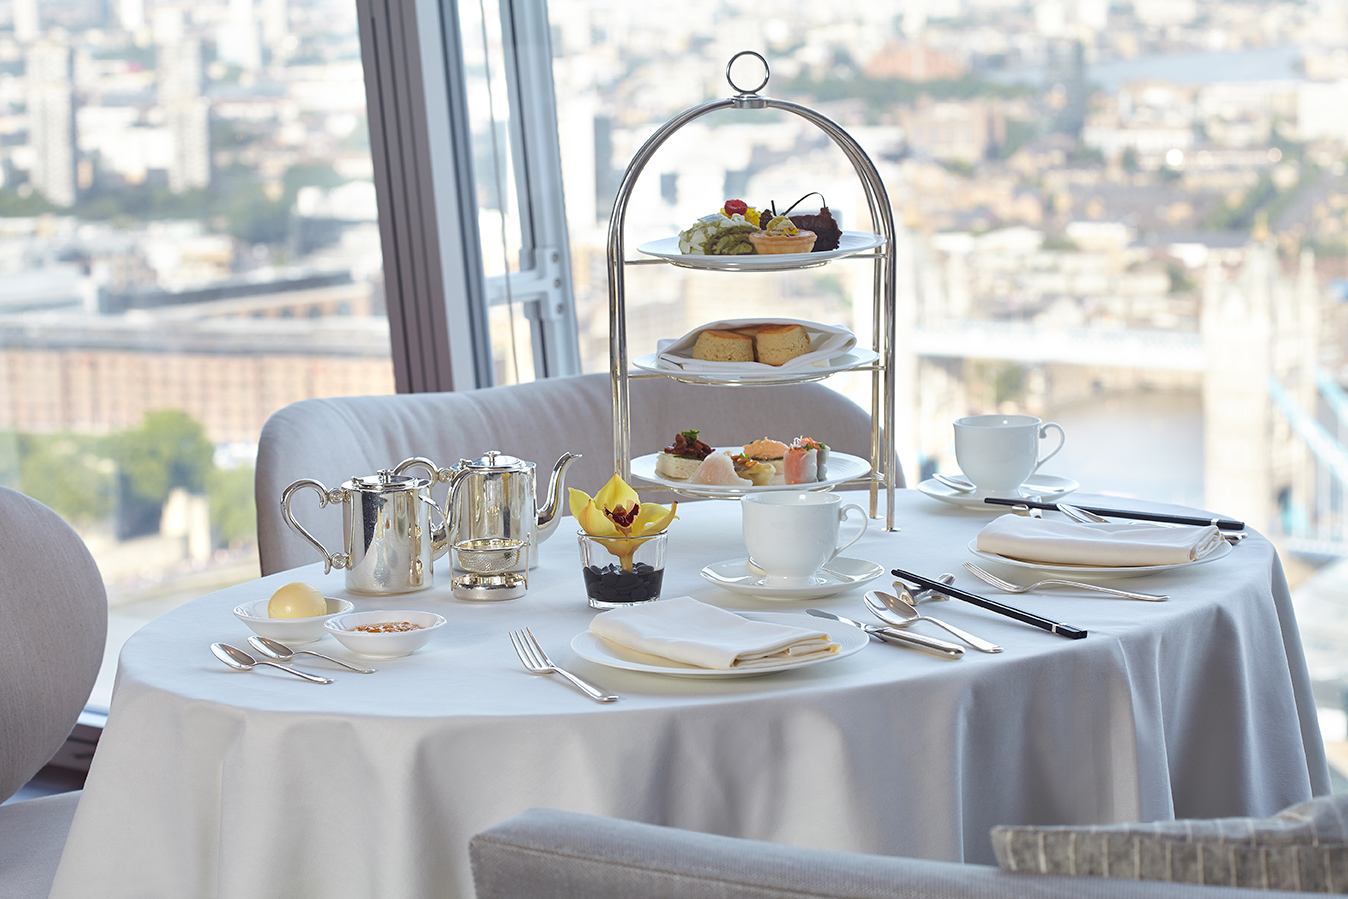 Asian Afternoon Tea at Ting Shangri La Hotel The Shard Londra